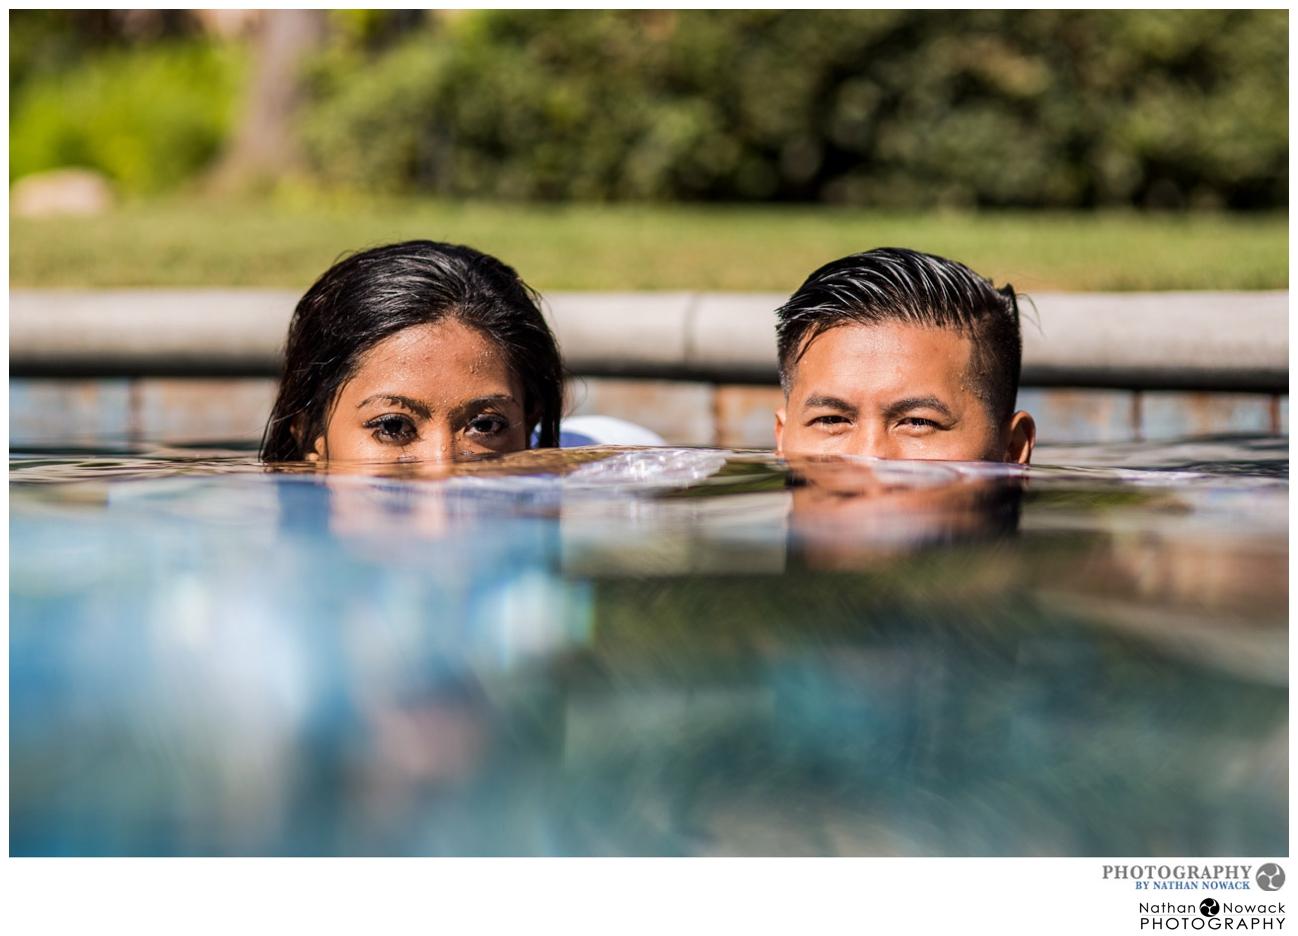 Underwater-trash-the-dress-pool-photo-shoot-wedding_0019